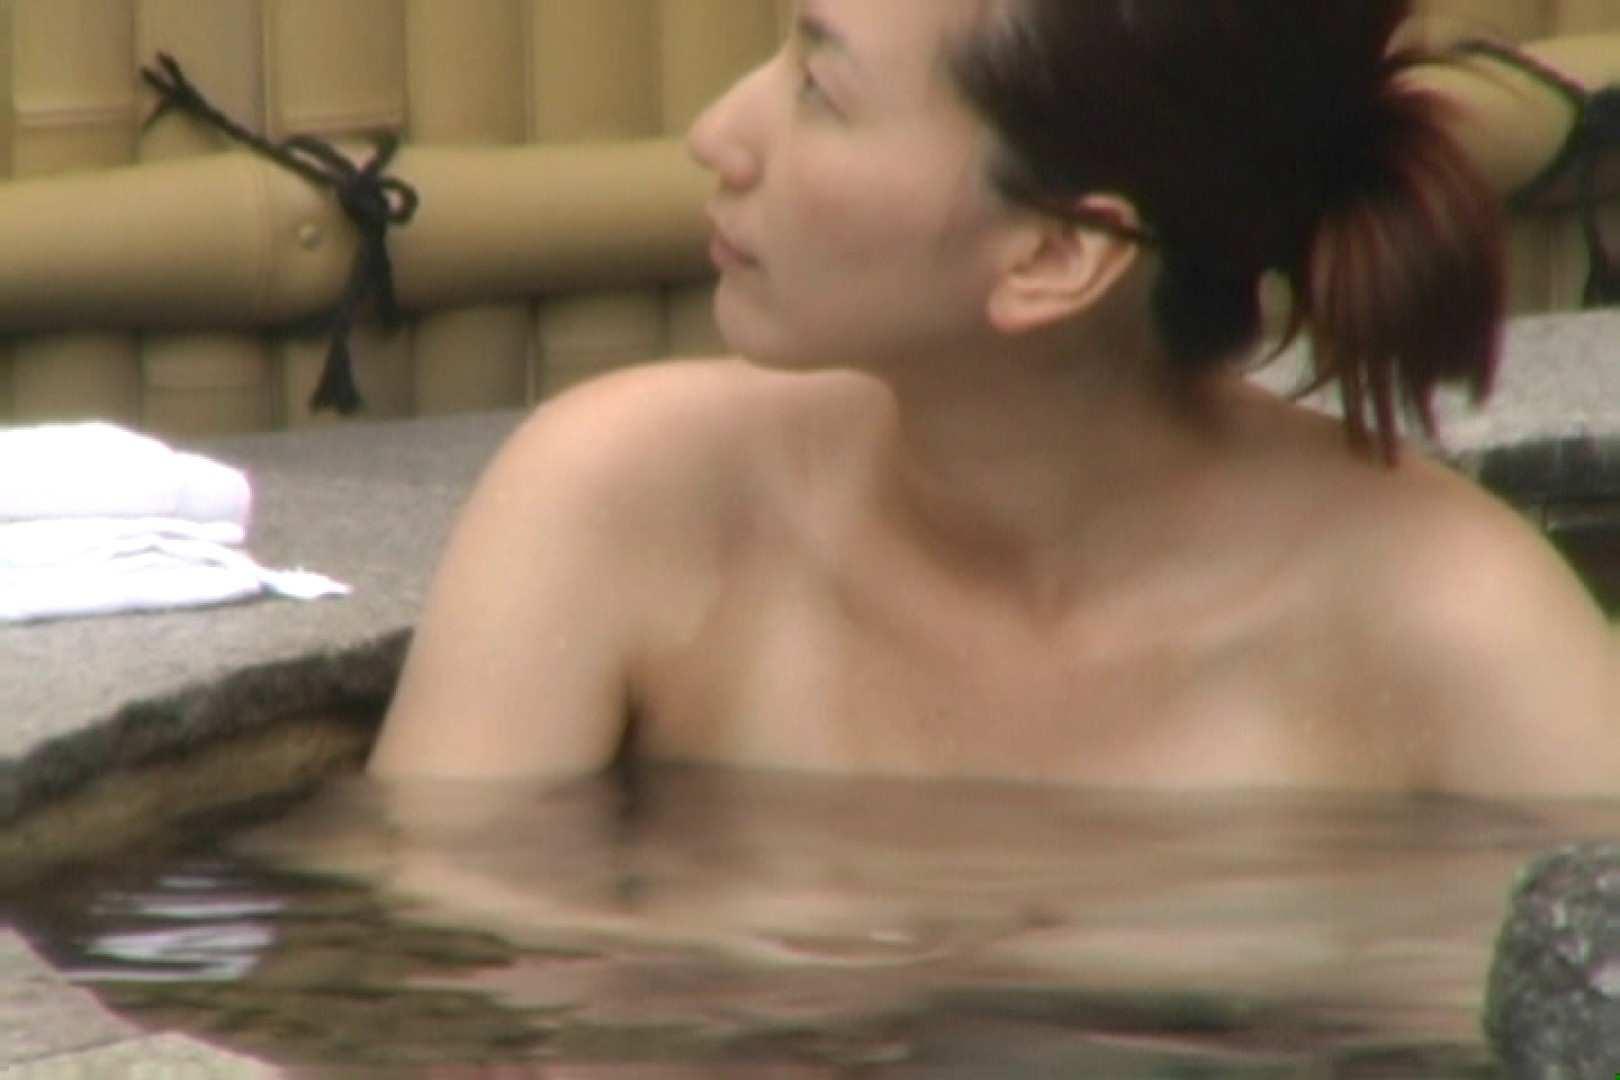 Aquaな露天風呂Vol.616 露天   OLセックス  99画像 67